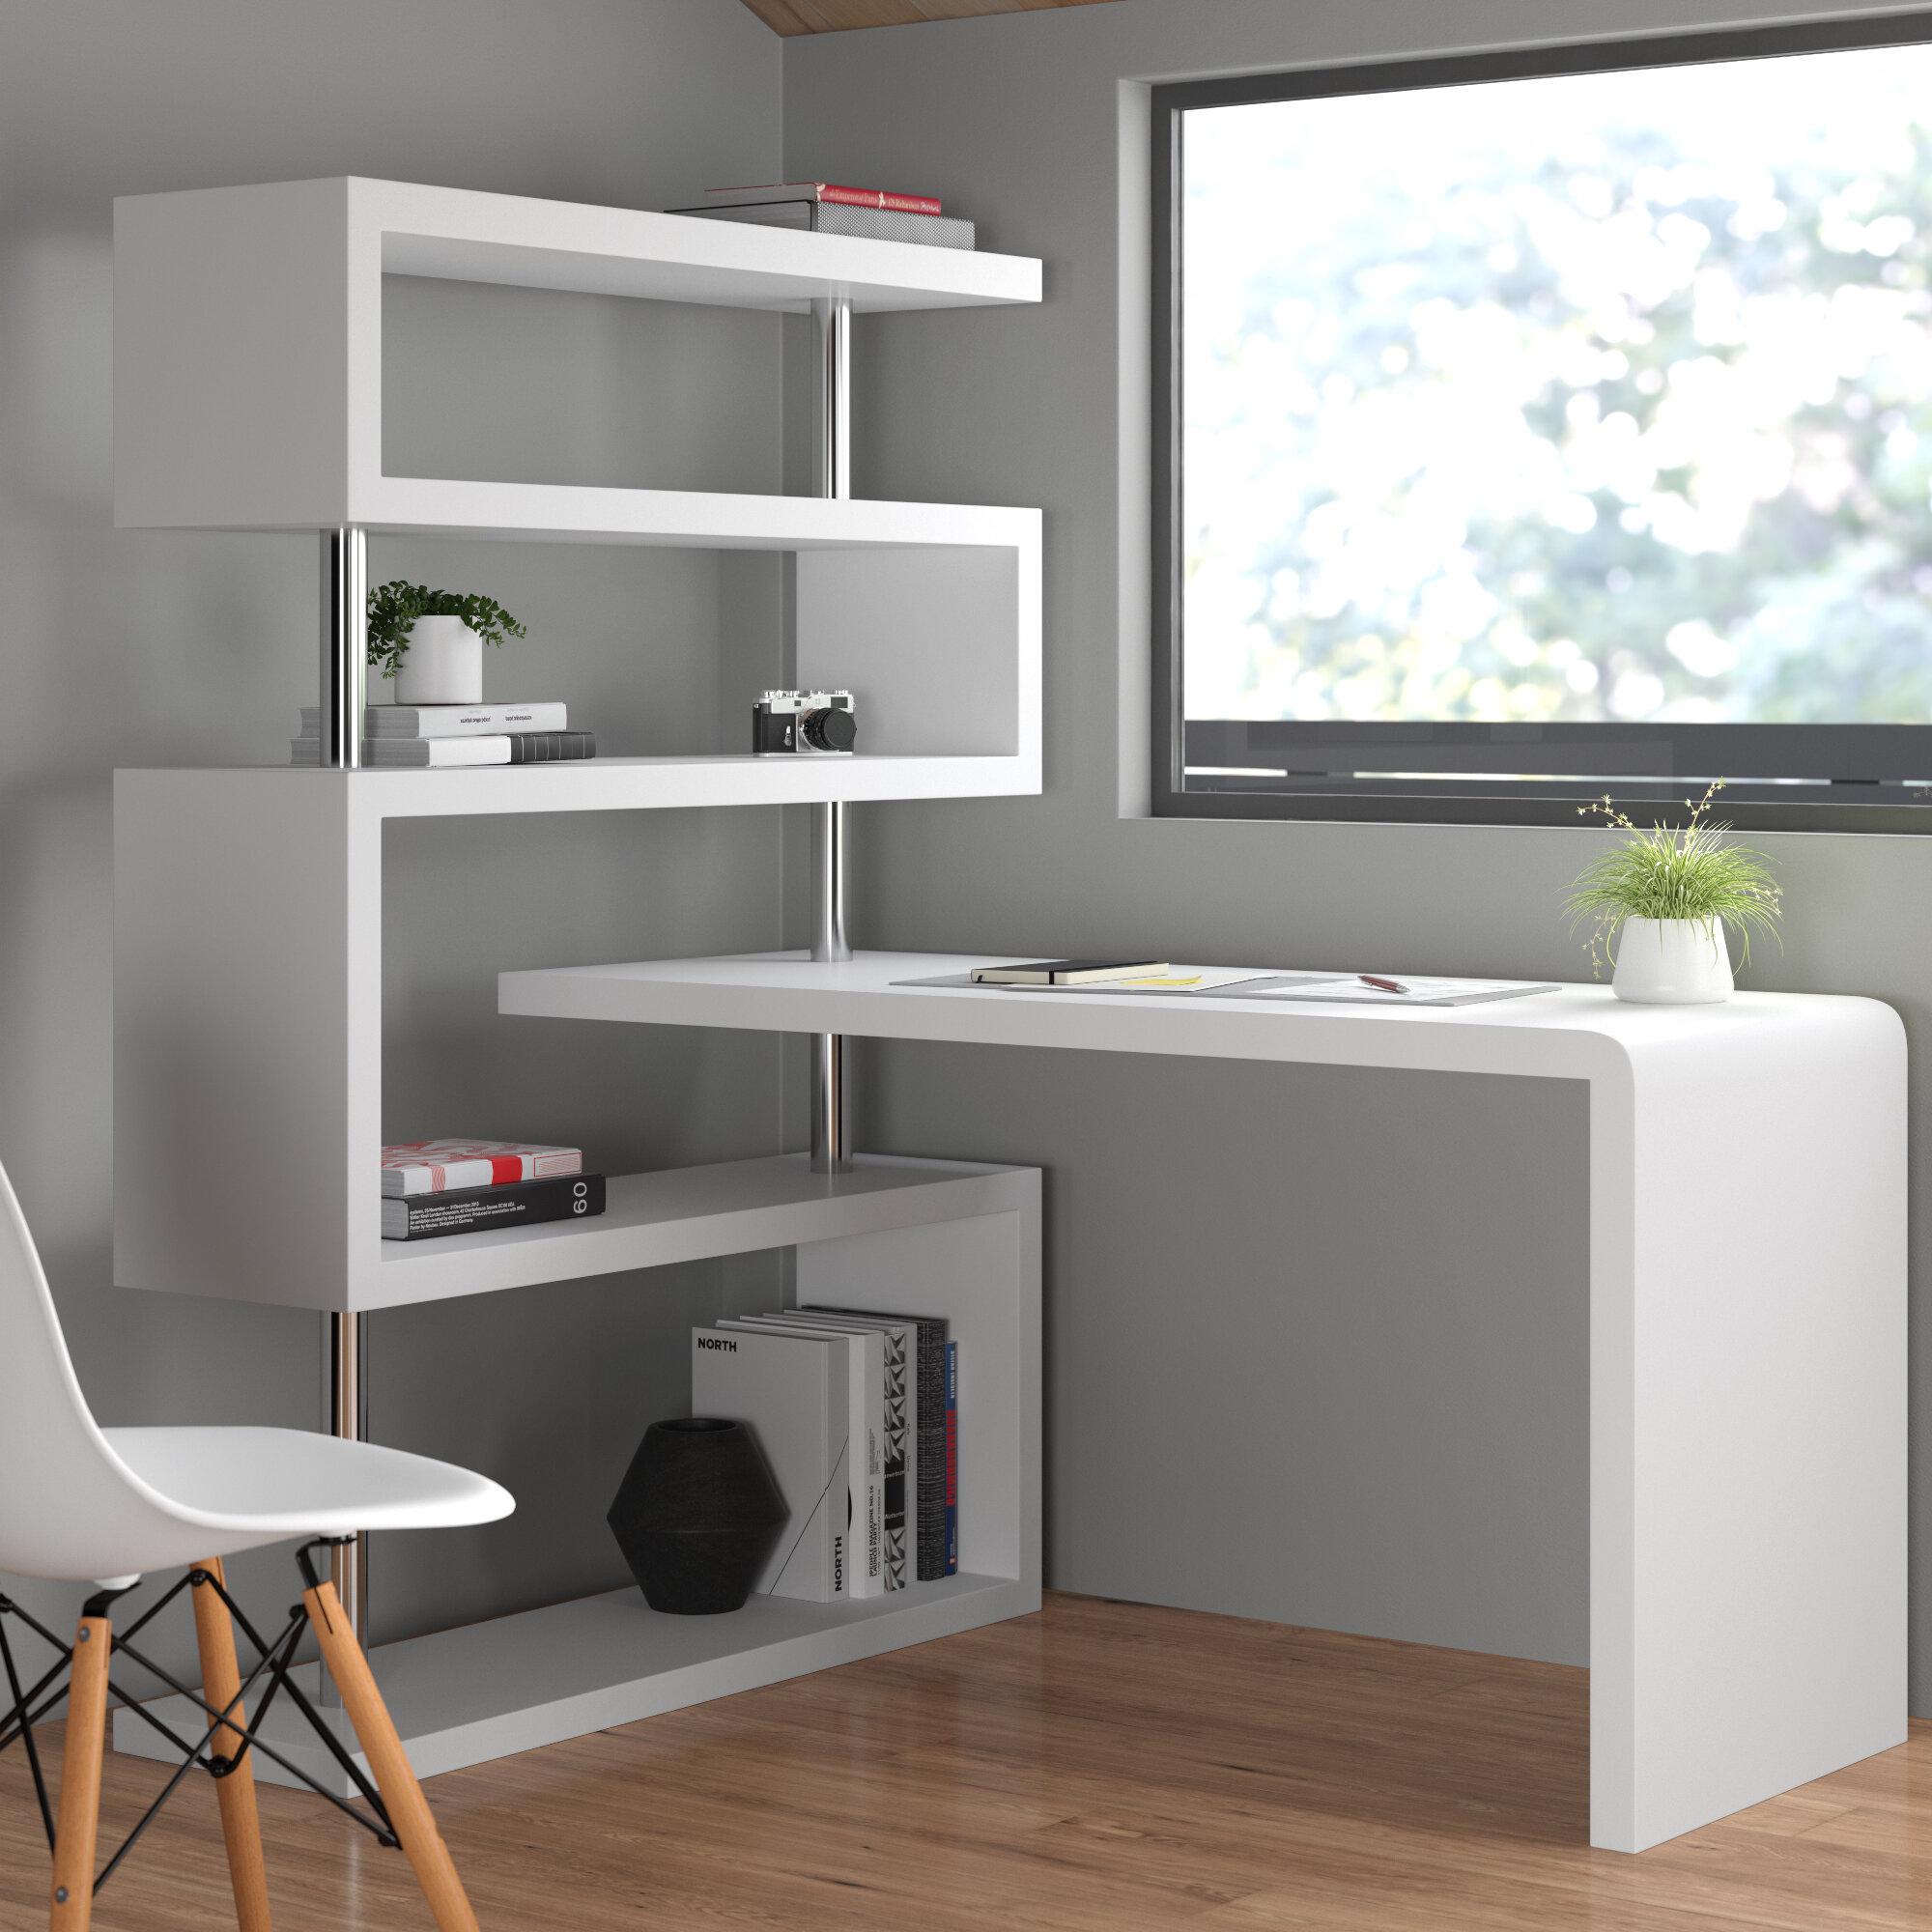 Waxman L Shape Credenza Desk With Bookcase